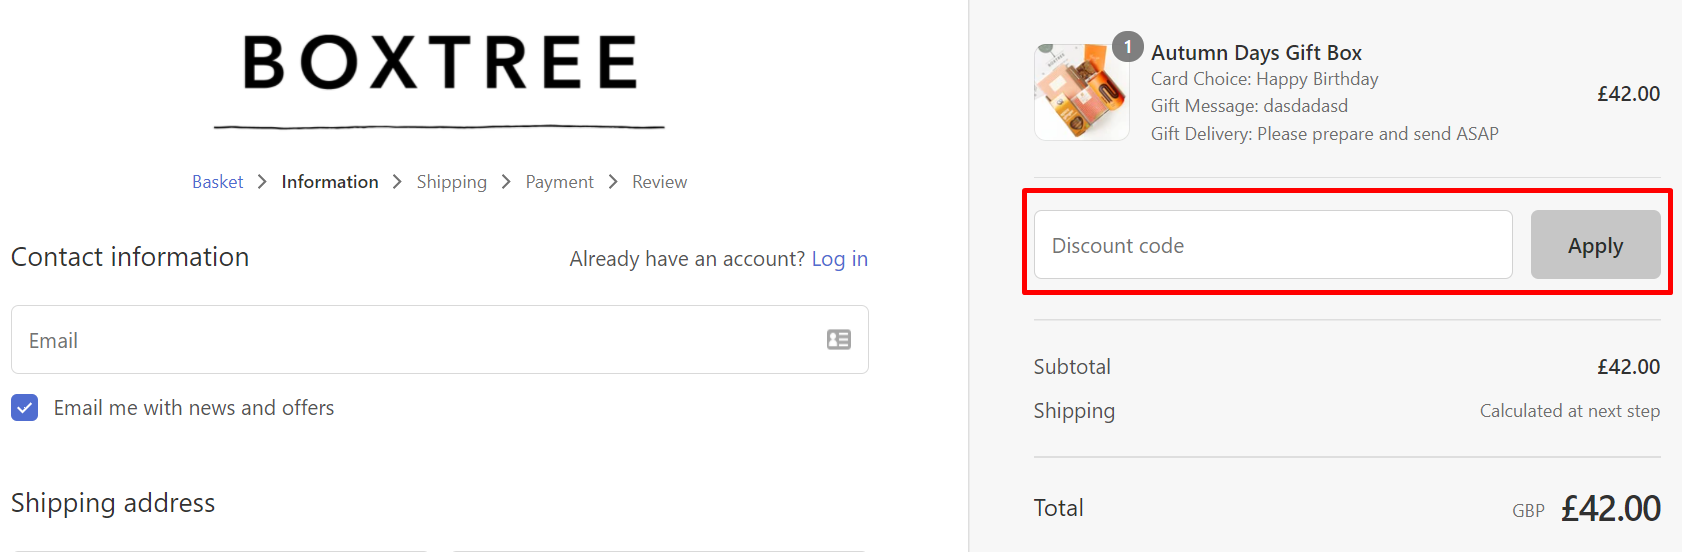 How do I use my BoxTree discount code?